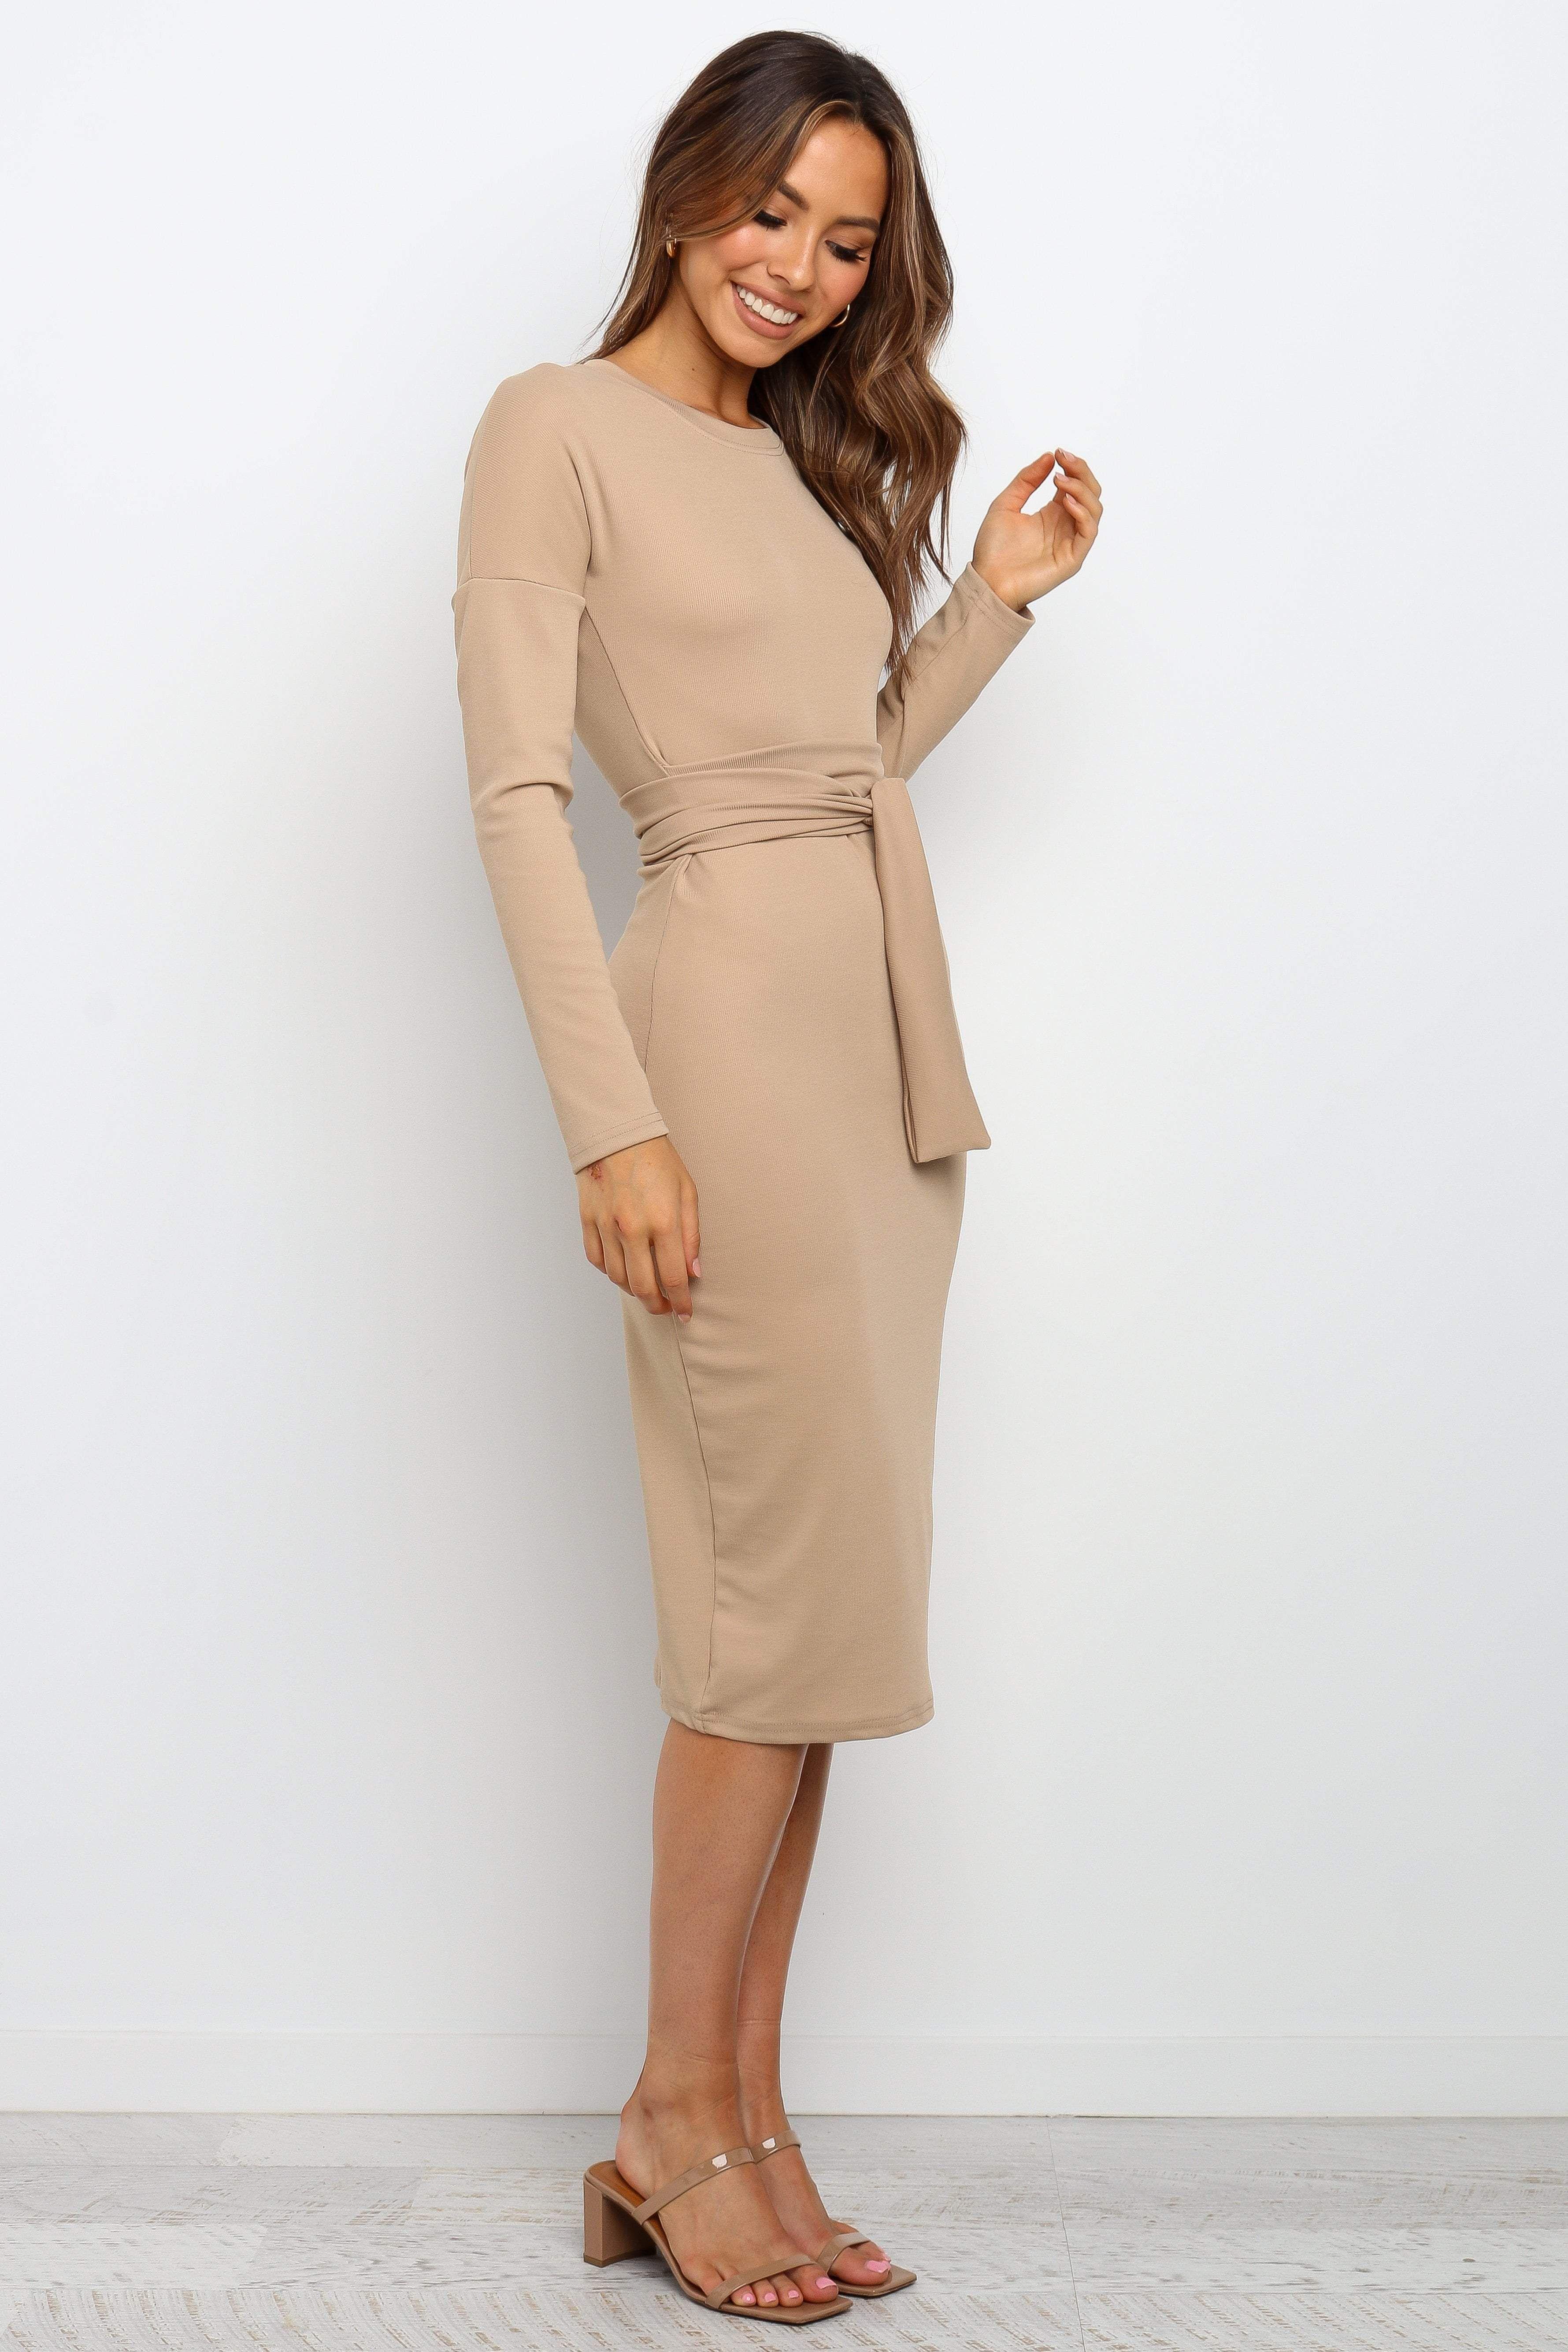 Baylee Dress Beige S Work Dresses For Women Dresses Dresses For Work [ 5338 x 3559 Pixel ]